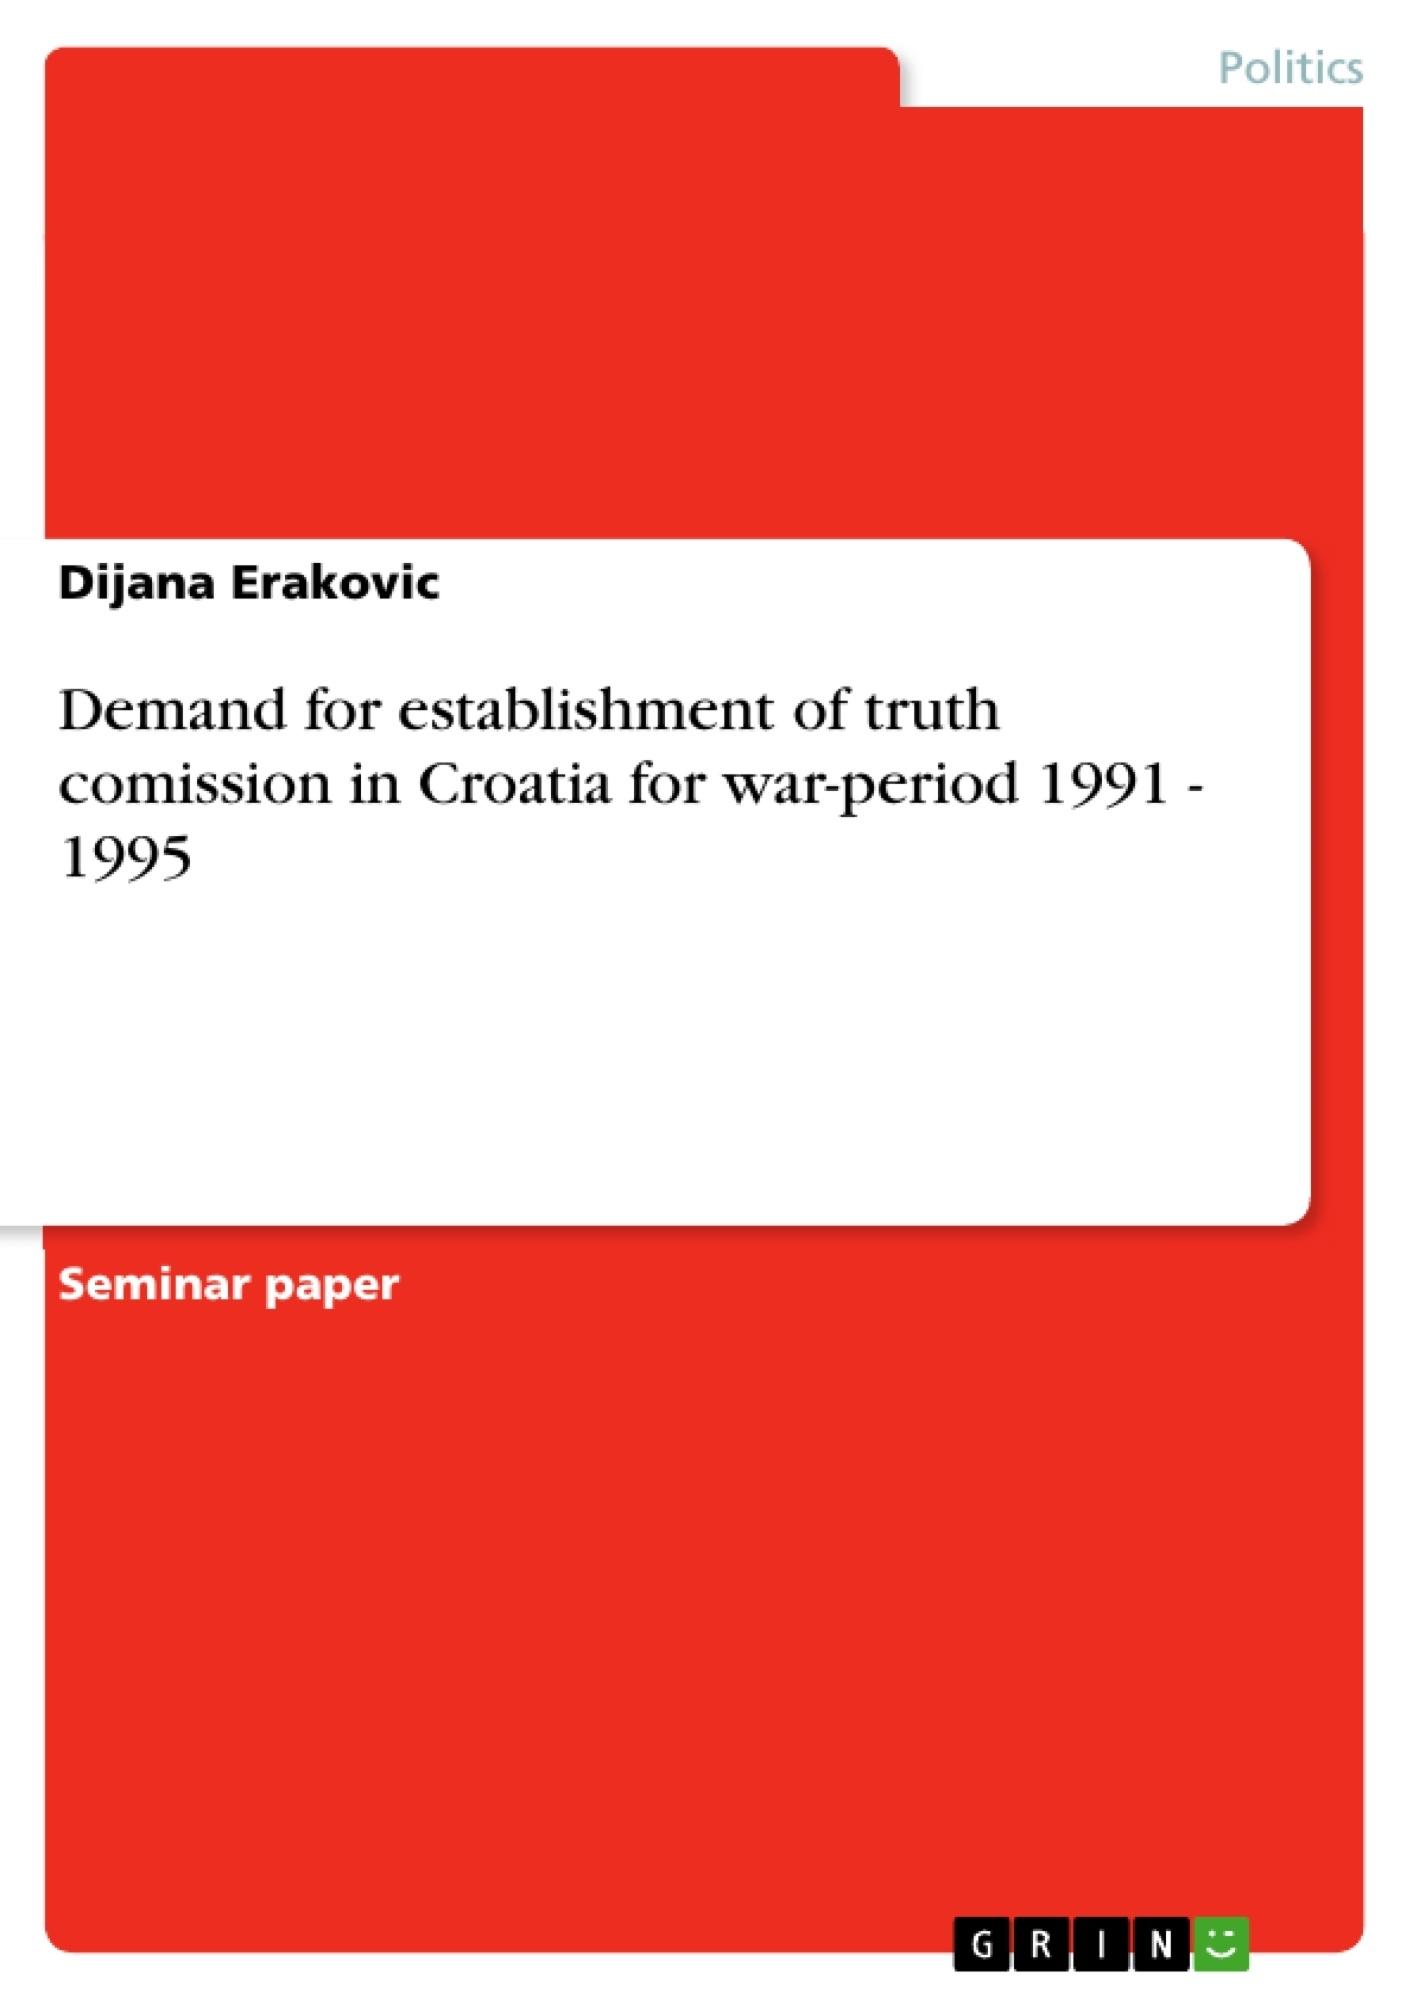 Title: Demand for establishment of truth comission in Croatia for war-period 1991 - 1995